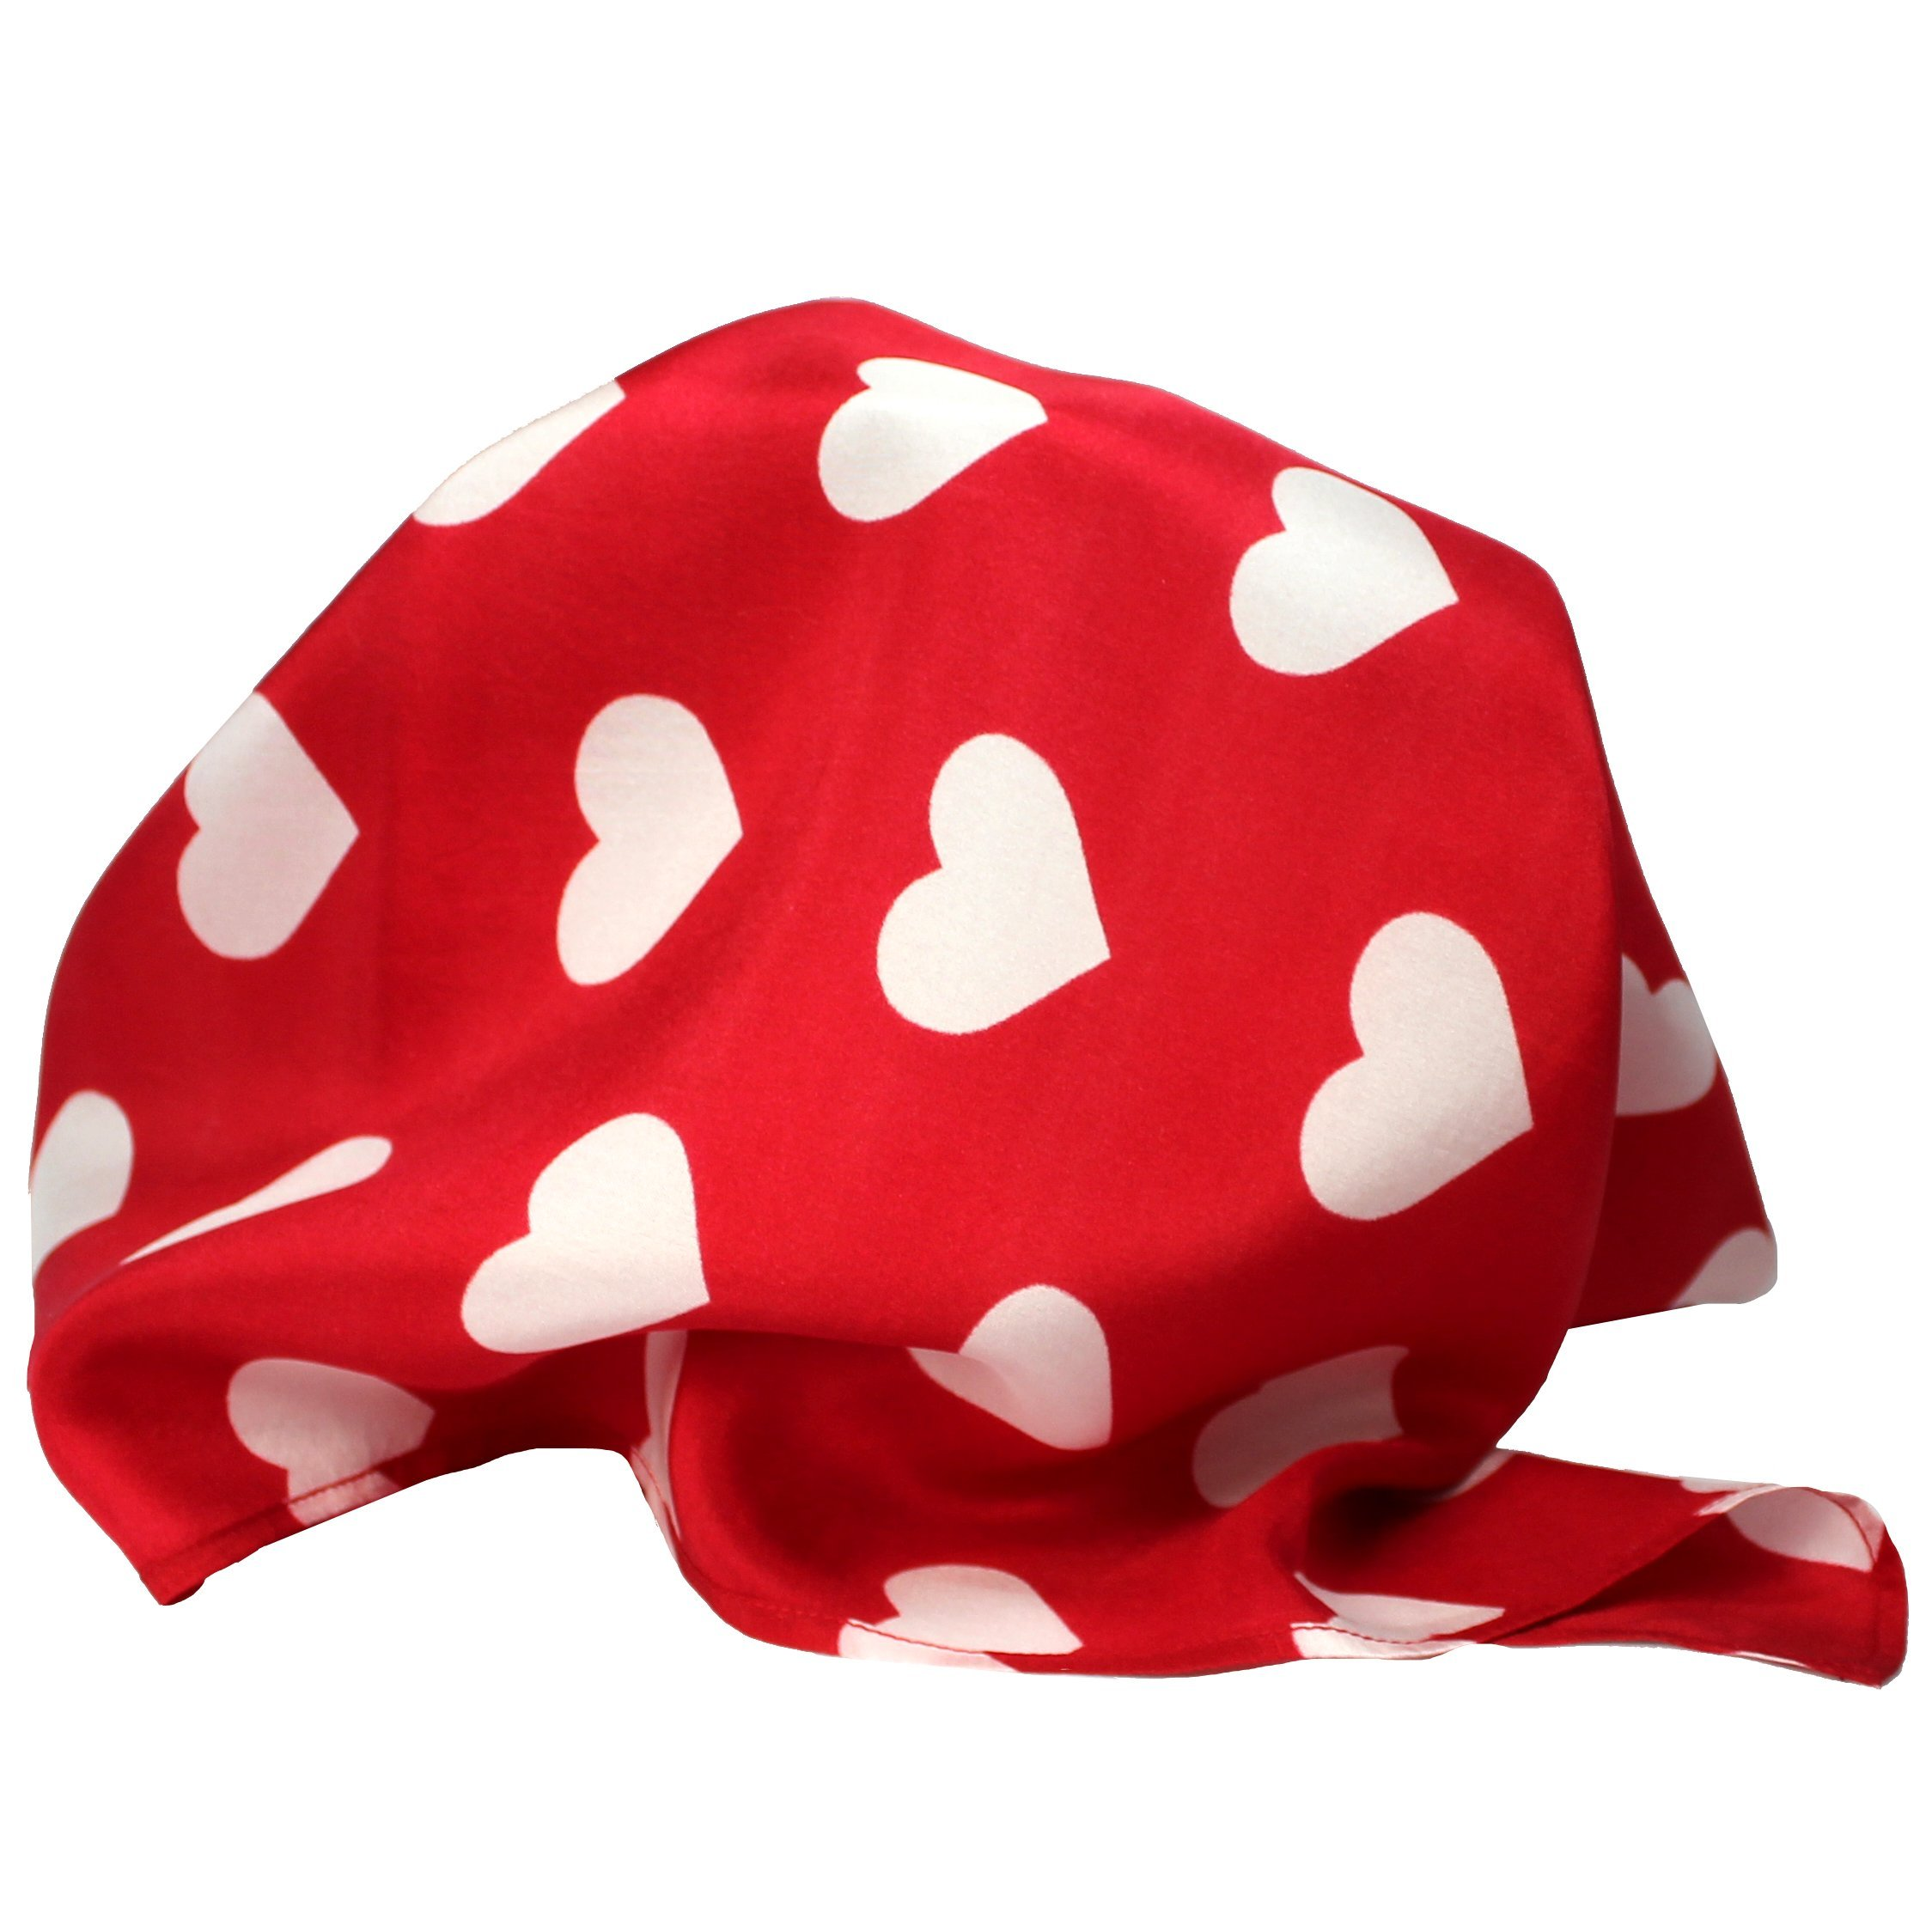 "Red Silk Valentine Pocket Square Handkerchief by Royal Silk – 16"" Sq. Silk Heart Design"